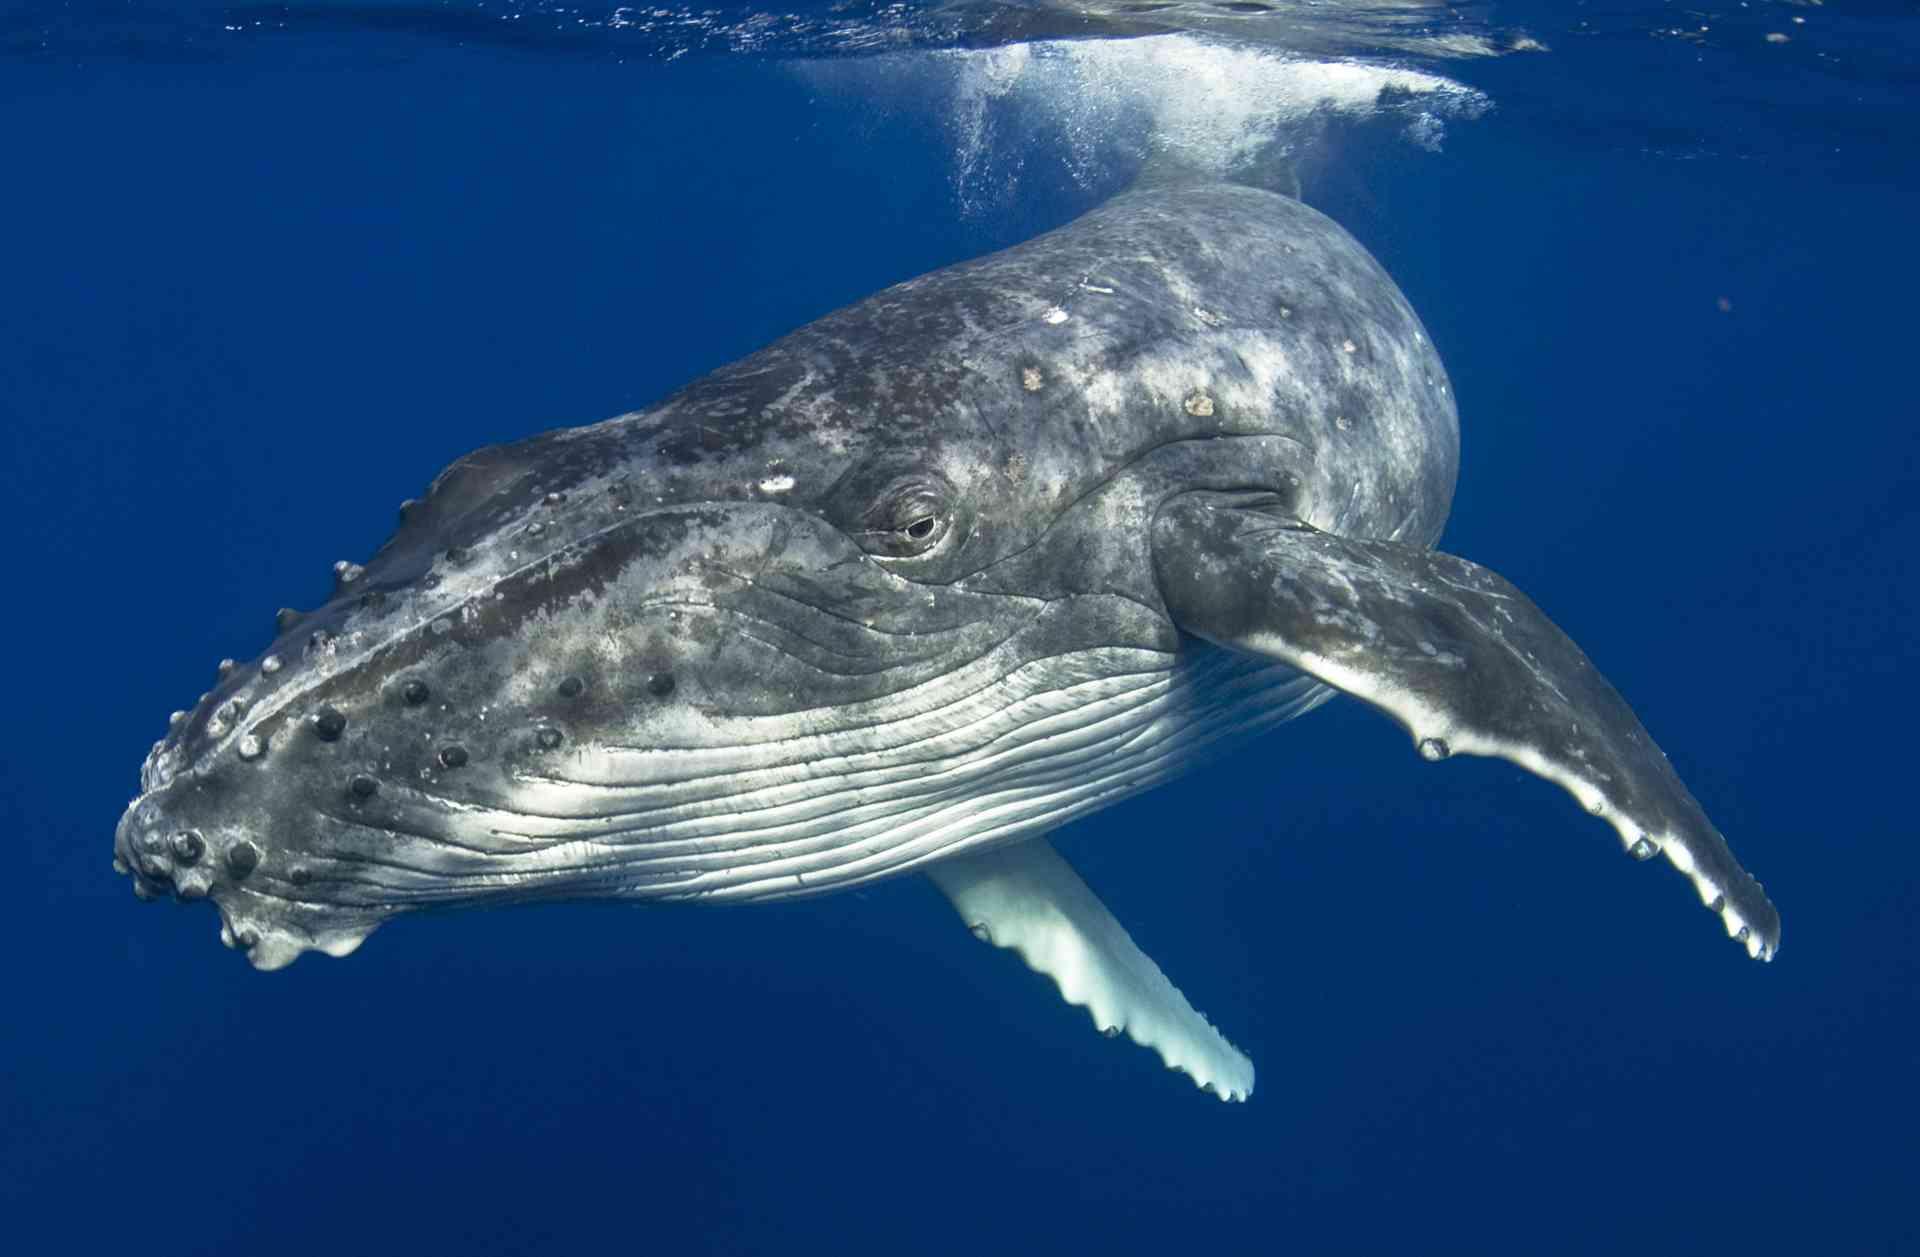 Witness the whales & wondrous wildlife